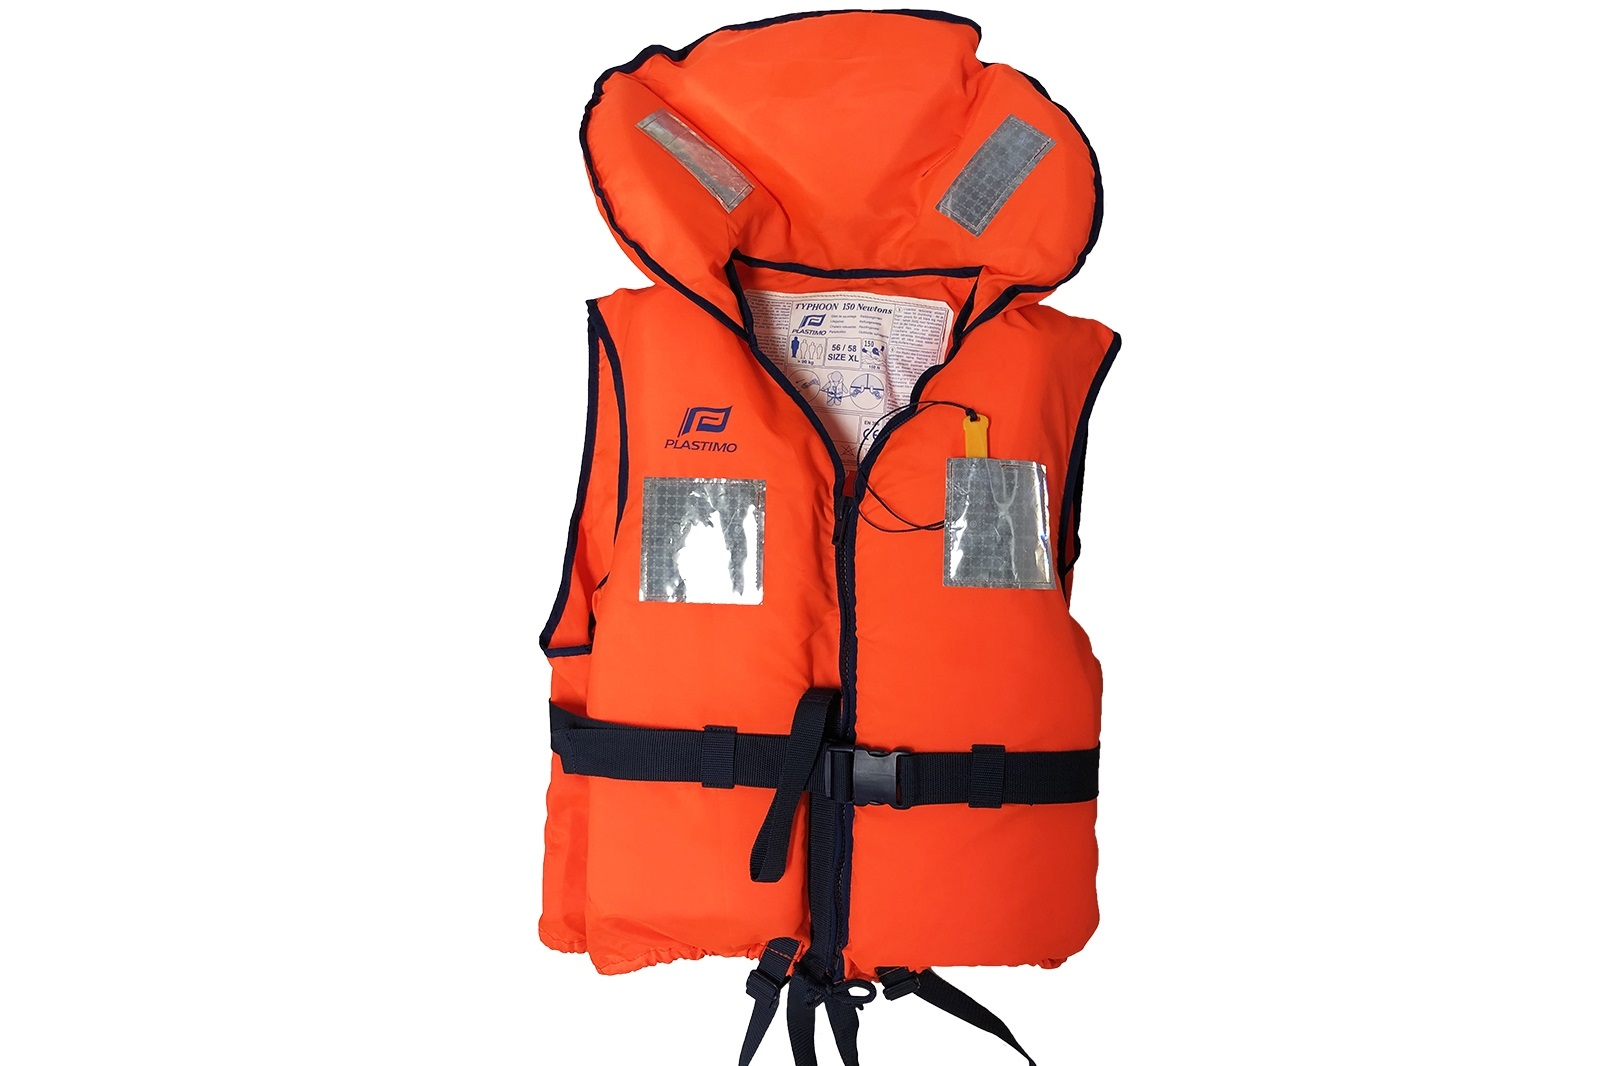 Záchranná vesta Plastimo Typhoon 150N.jpg